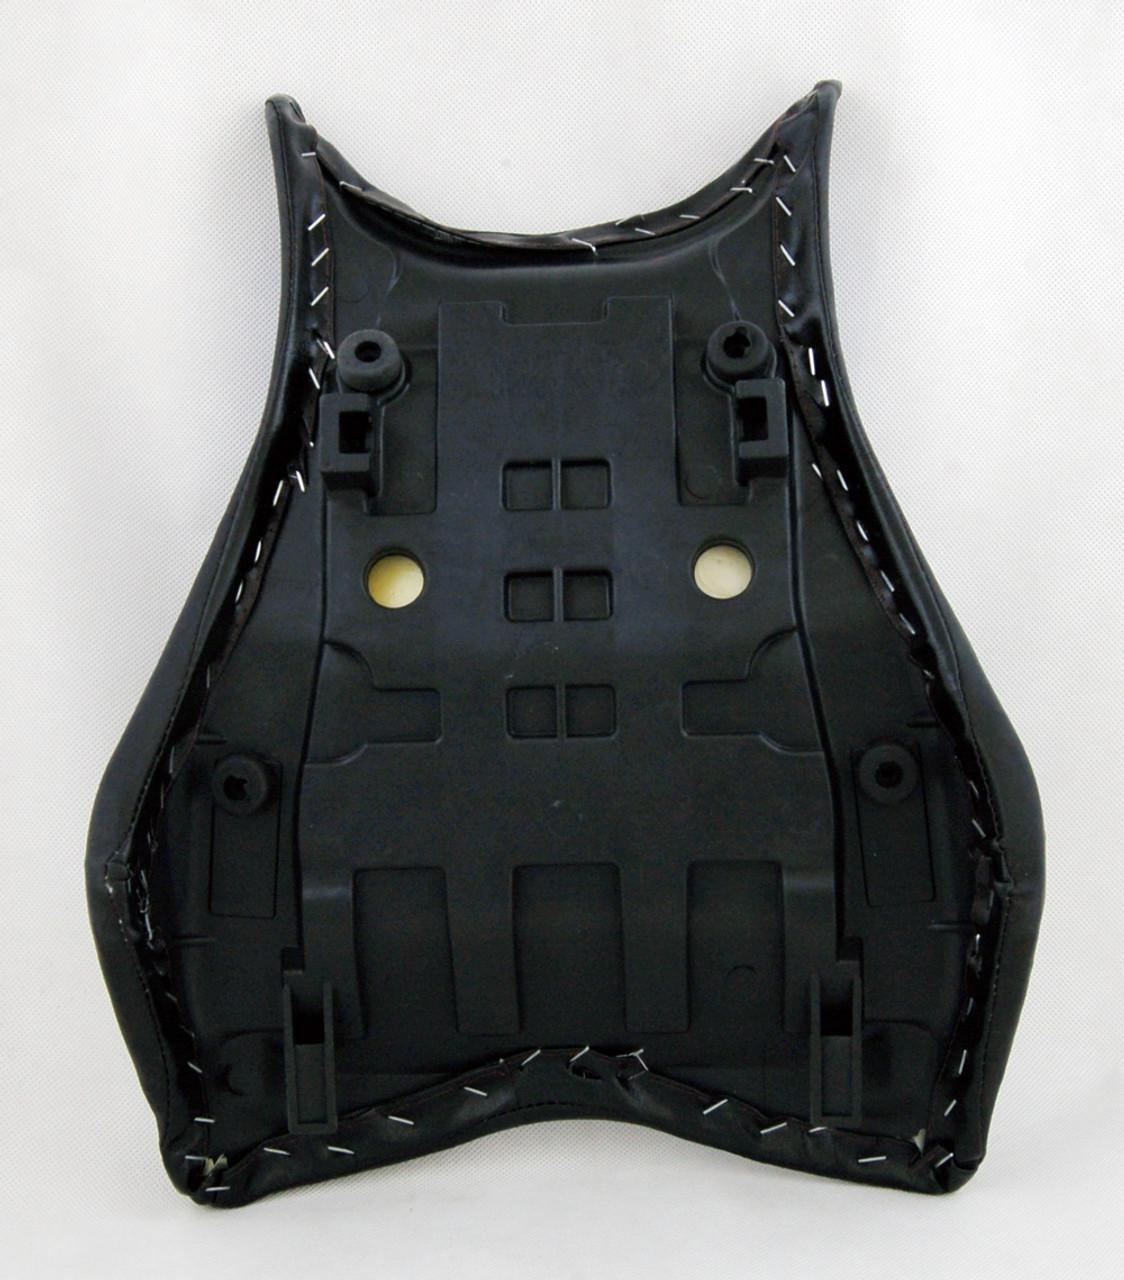 Driver Rider seat cover For Honda CBR 1000 RR (2008-2011) FlameBL (M512-F002-FlameBL)